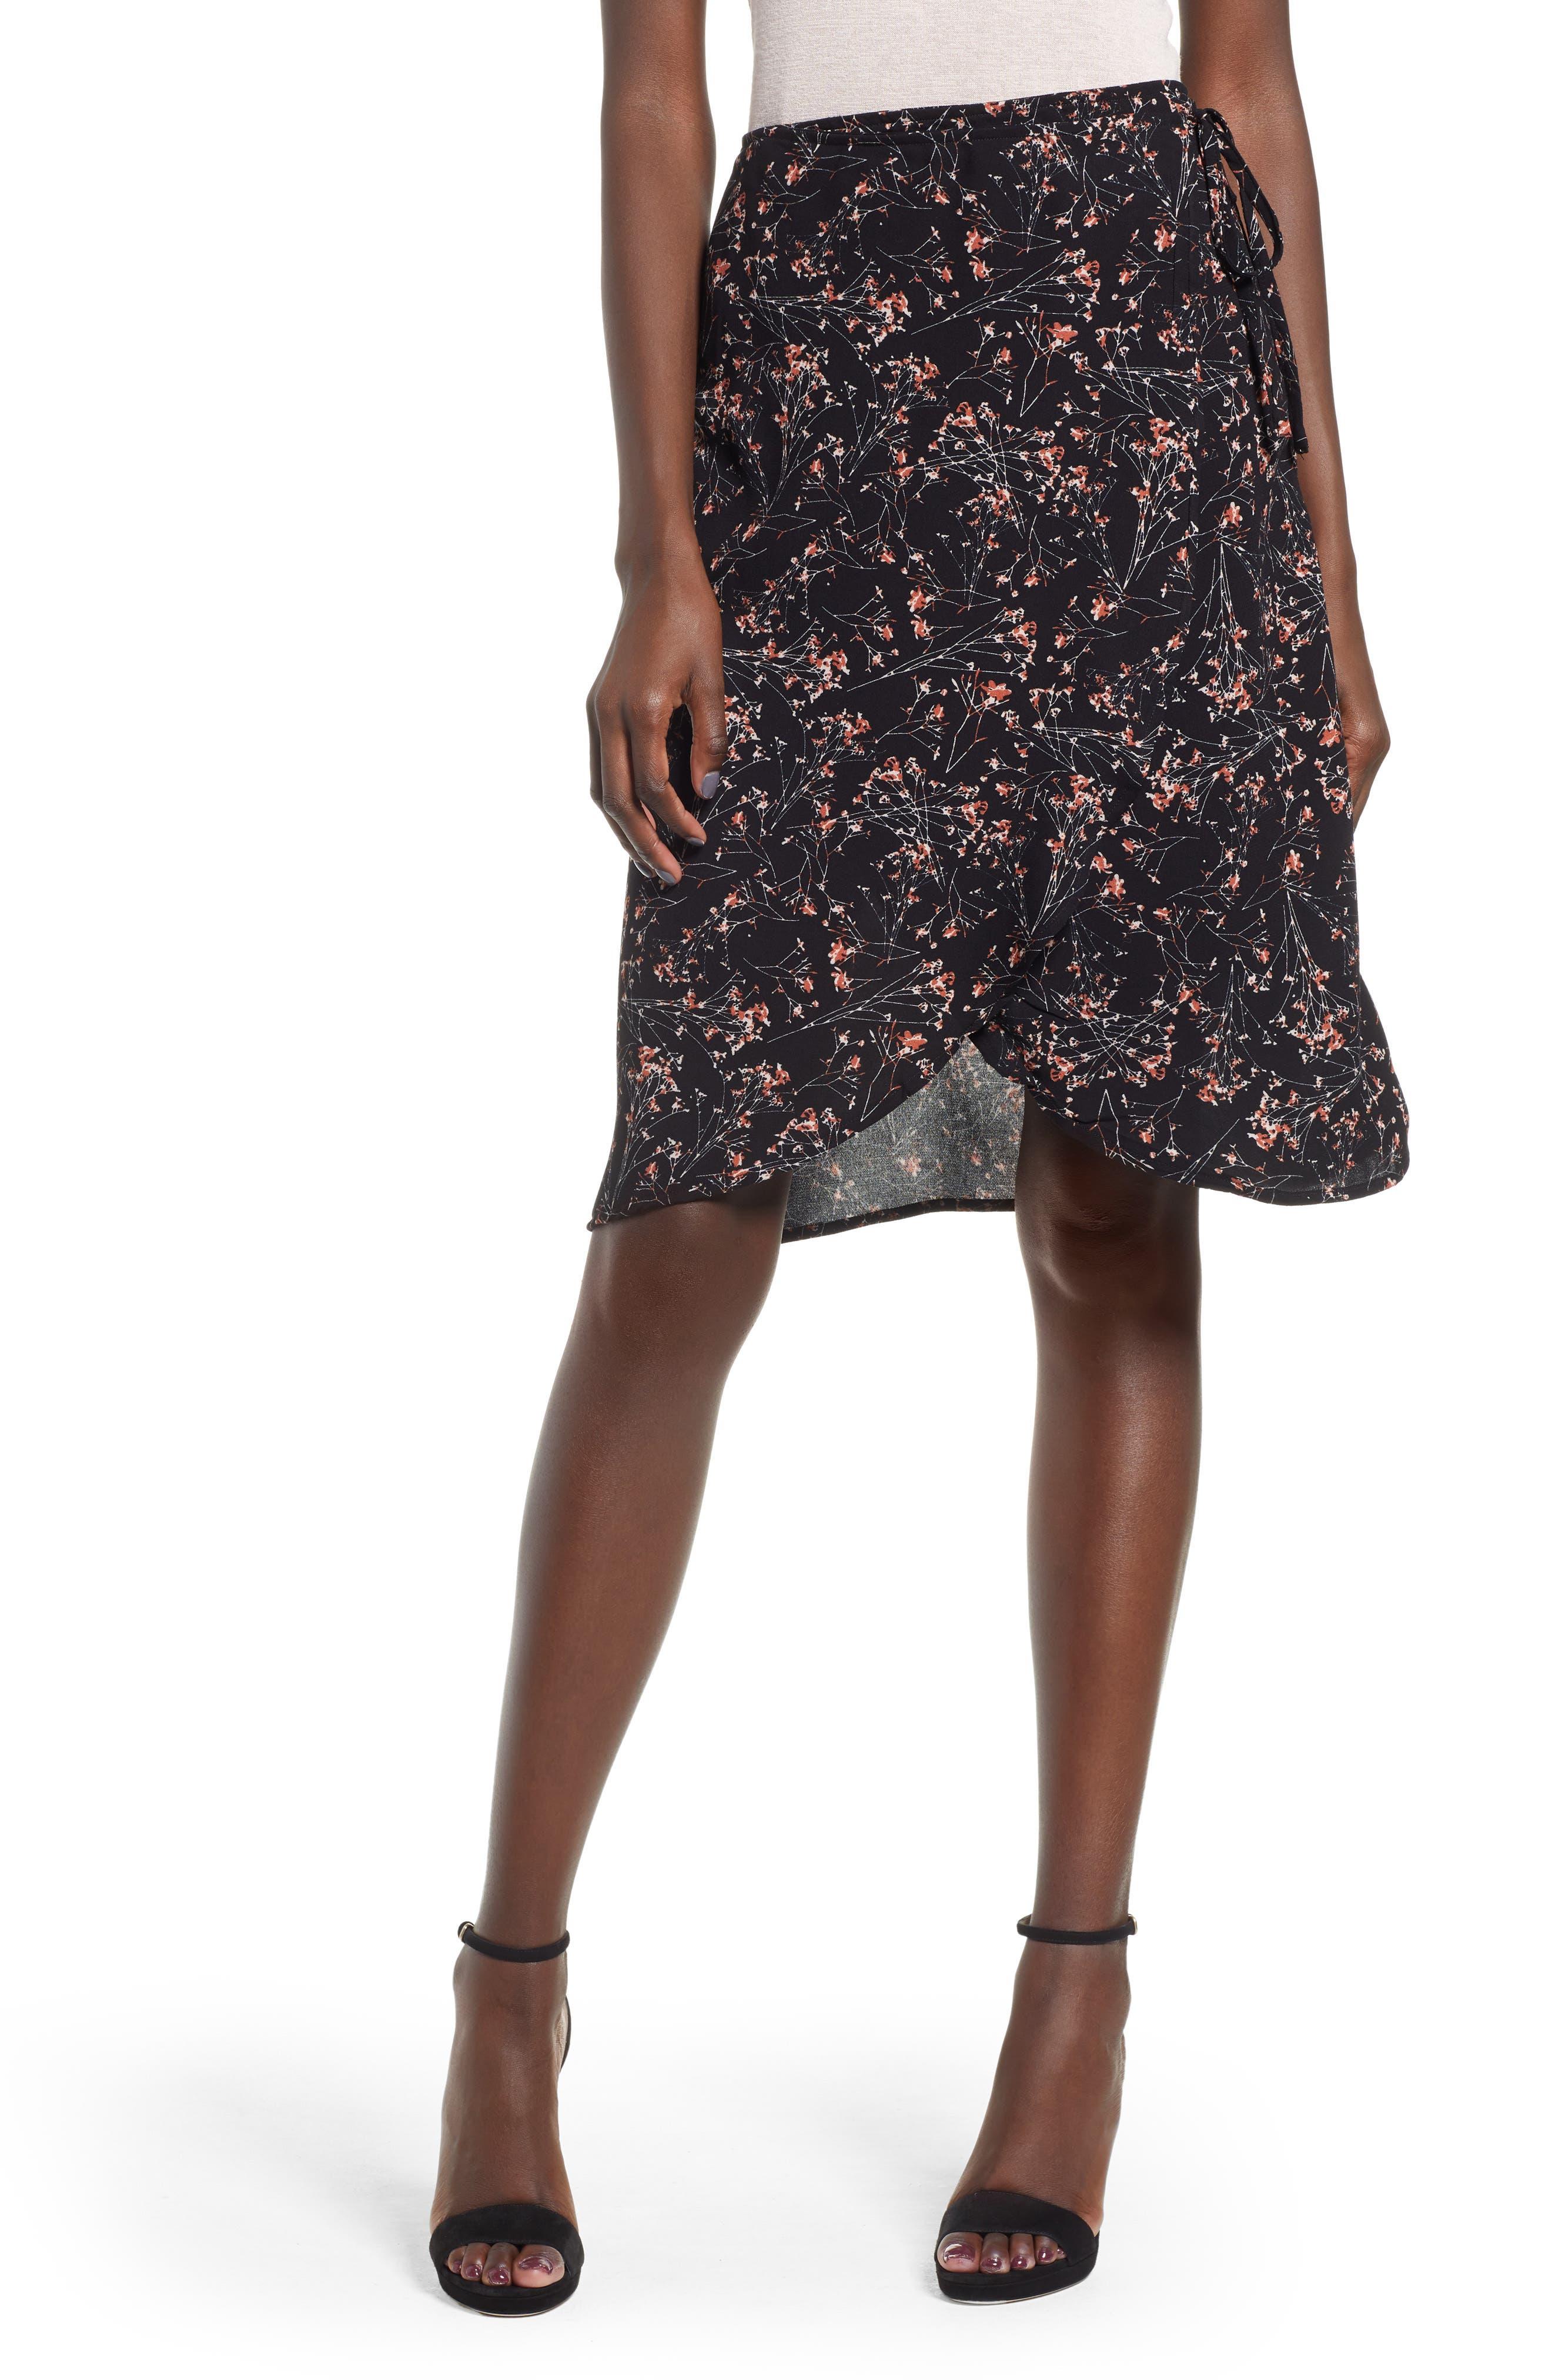 Lira Clothing Wrap Me Up Print Wrap Skirt, Black